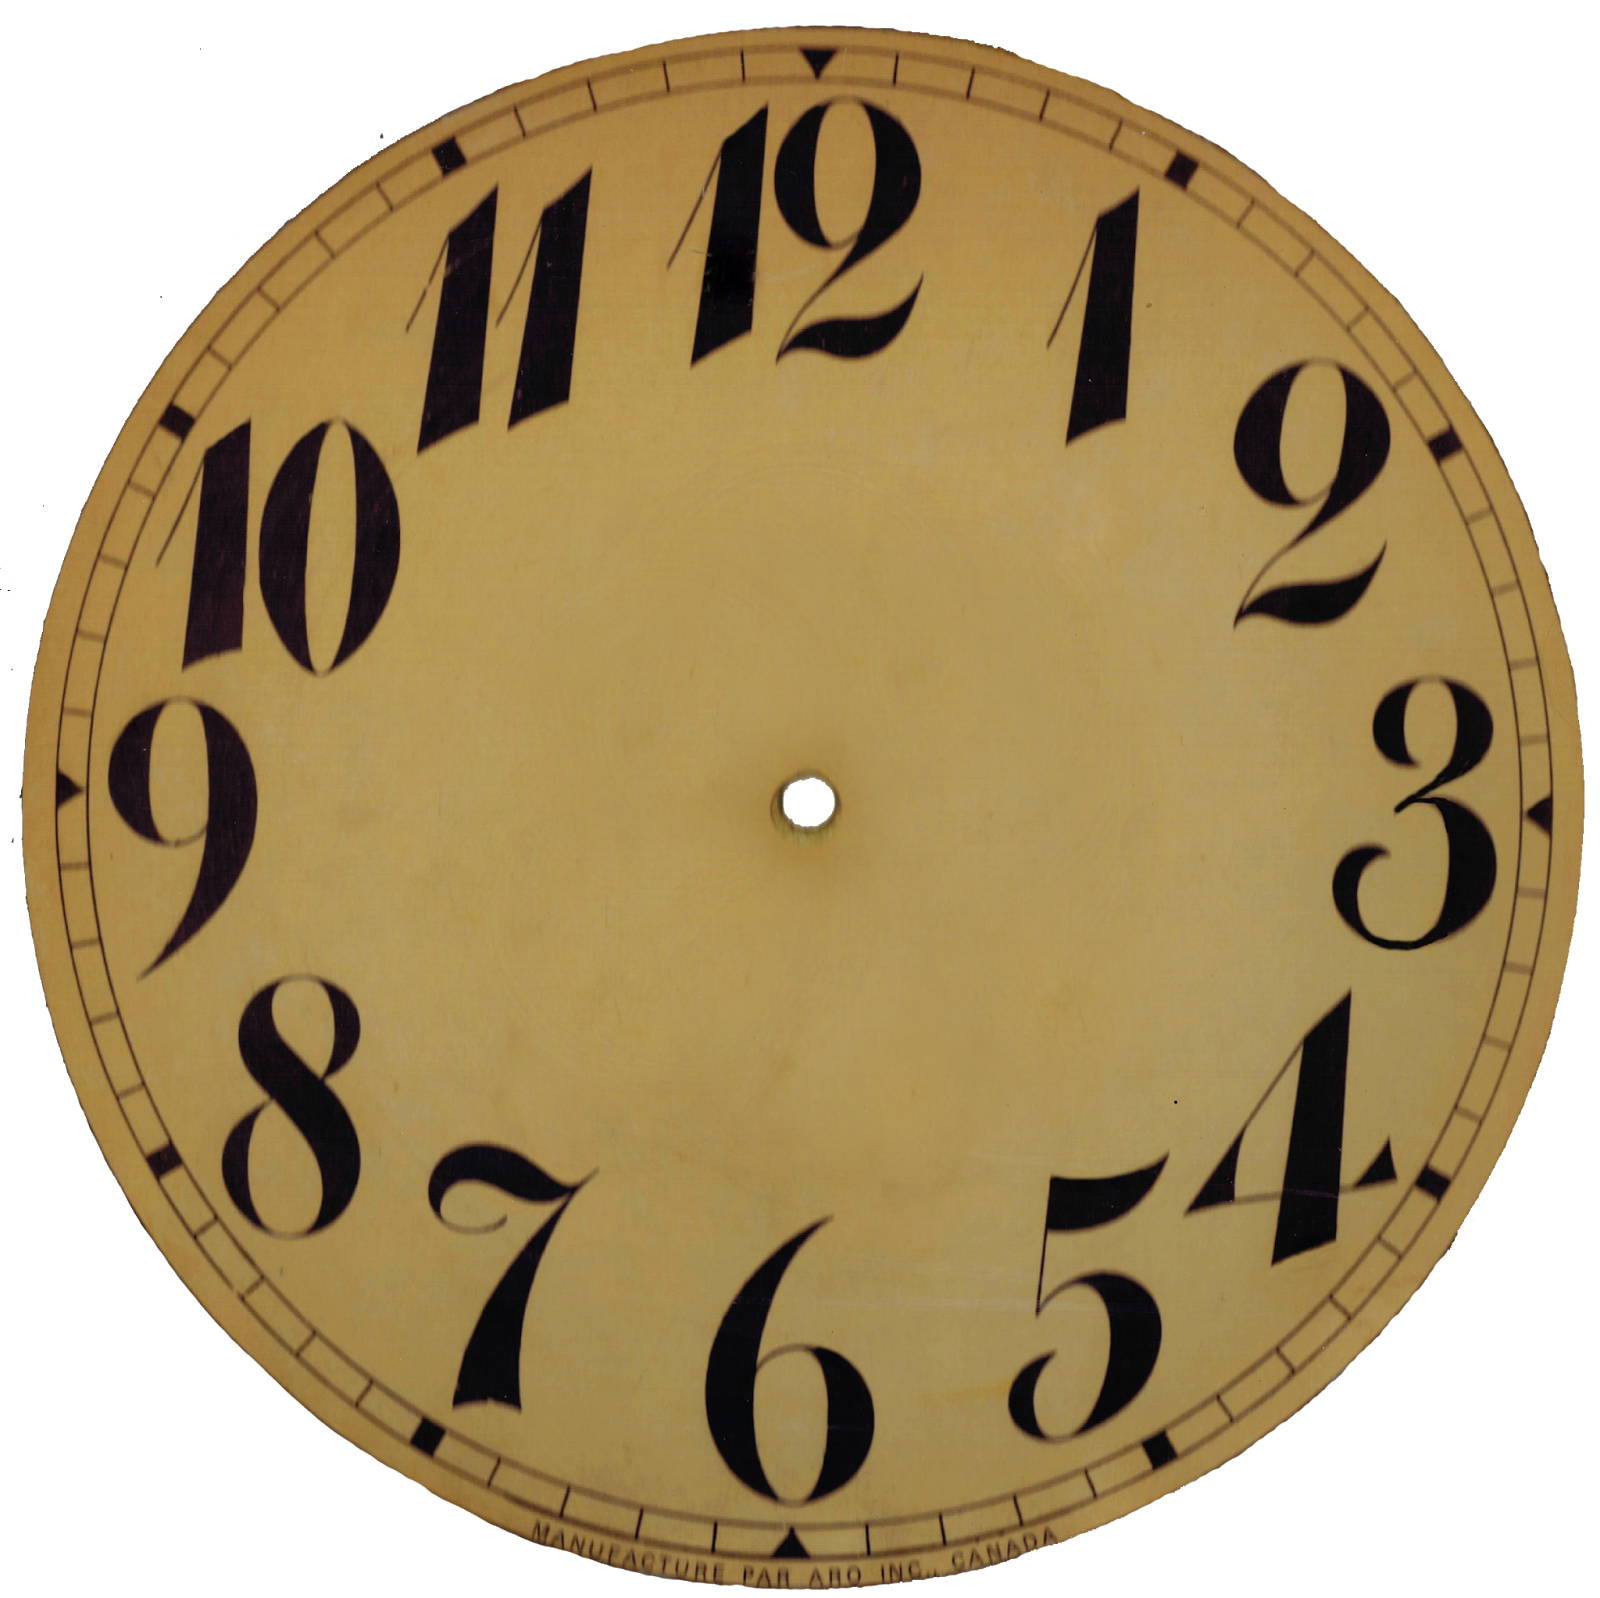 Clock clipart hickory dickory dock. Face printable acur lunamedia